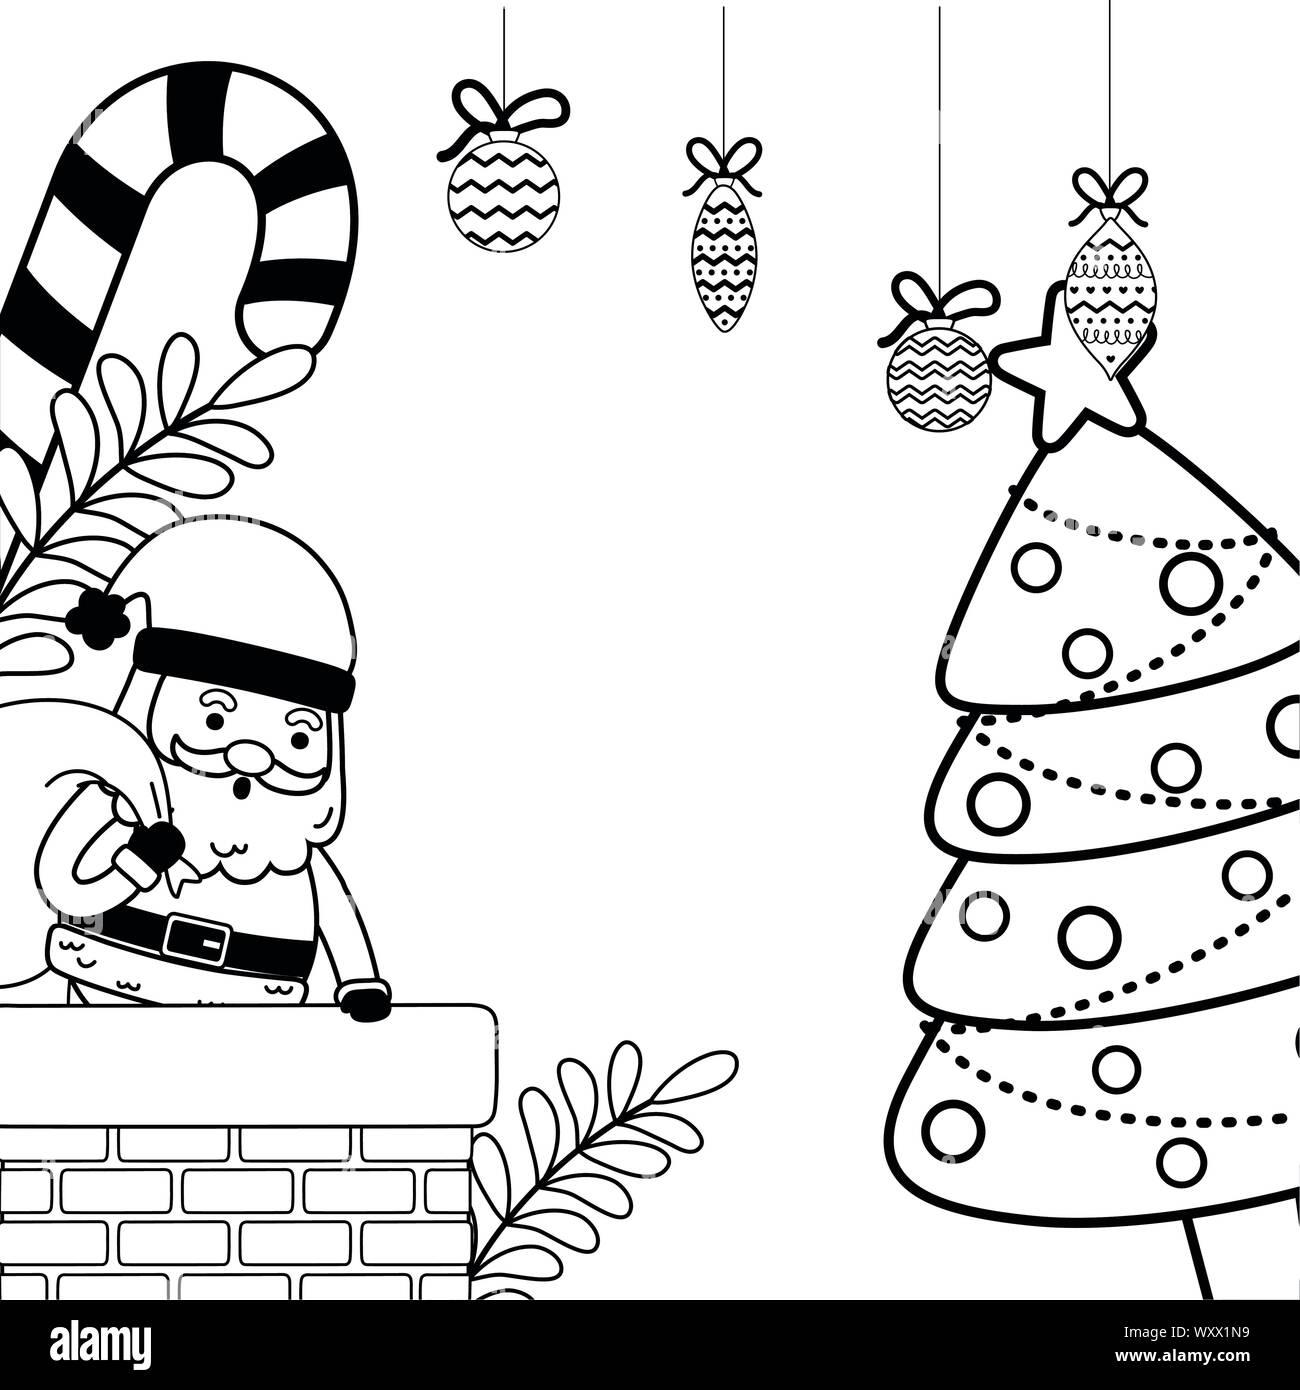 Santa Claus Design Merry Christmas Season Decoration Card Invitation Celebration And Holiday Theme Vector Illustration Stock Vector Image Art Alamy